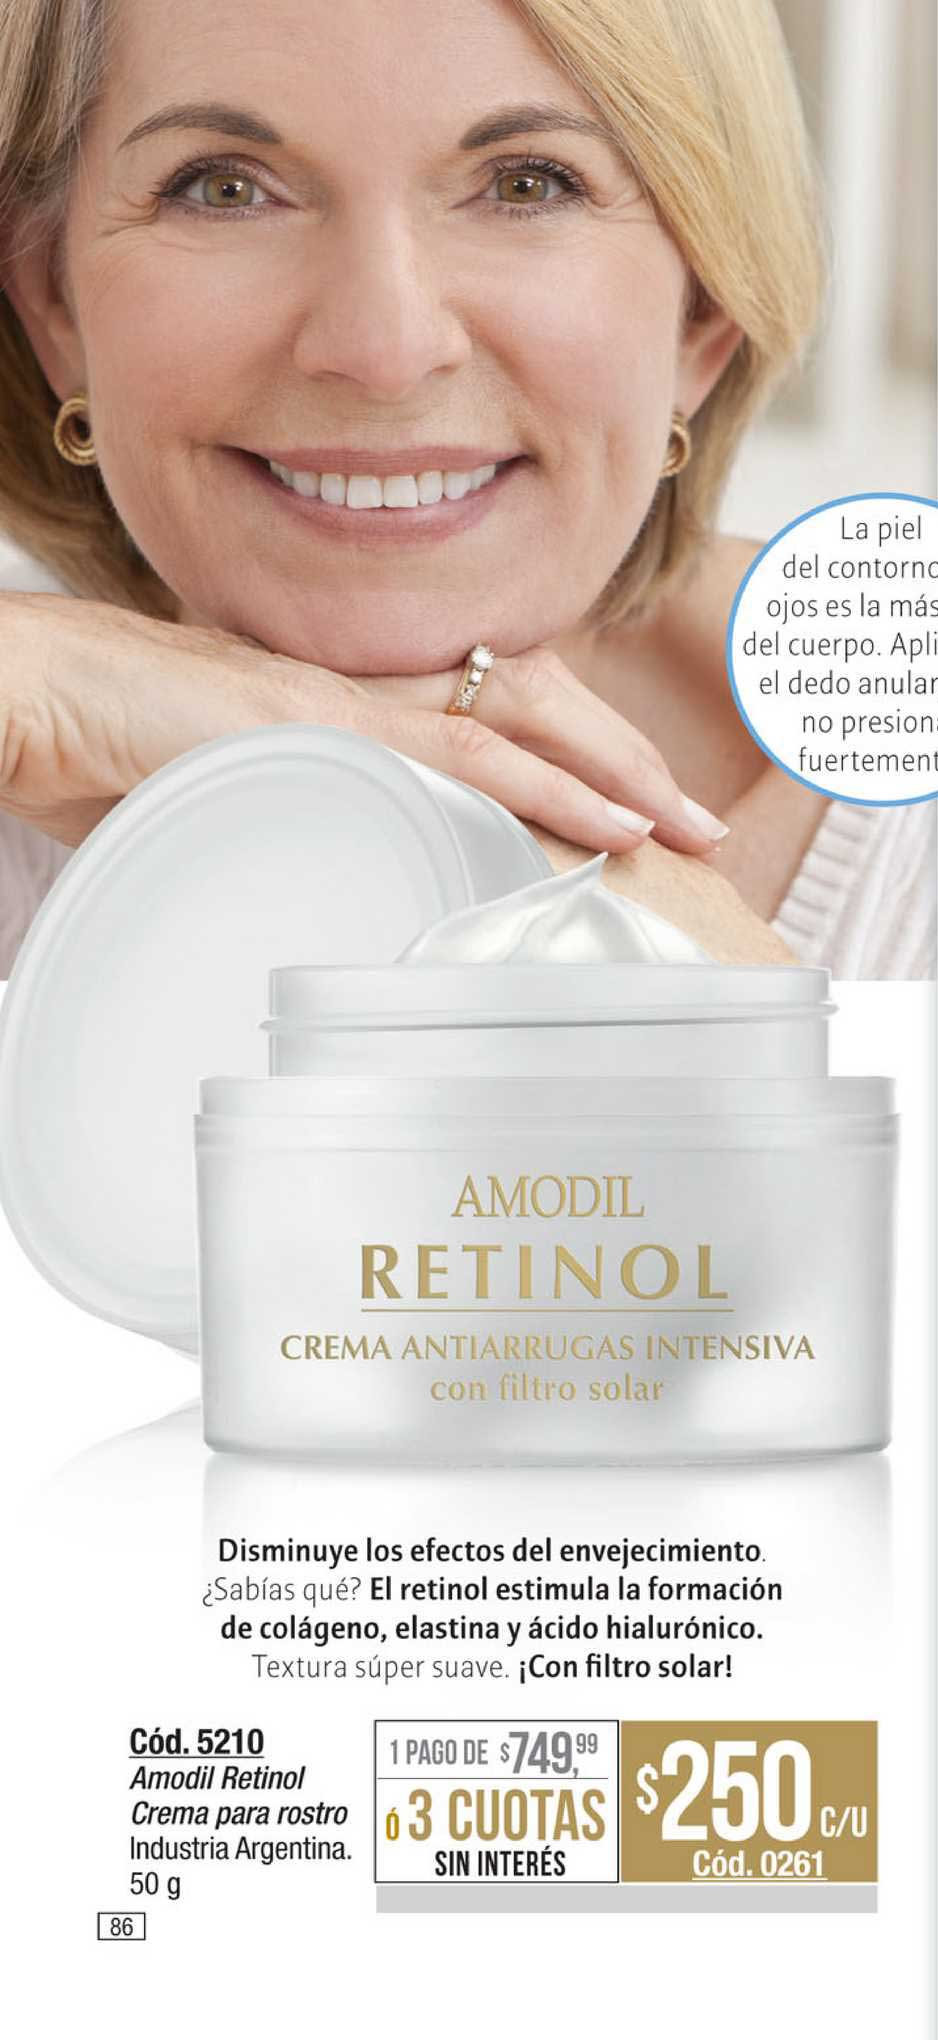 Amodil Amodil Retinol Crema Para Rostro